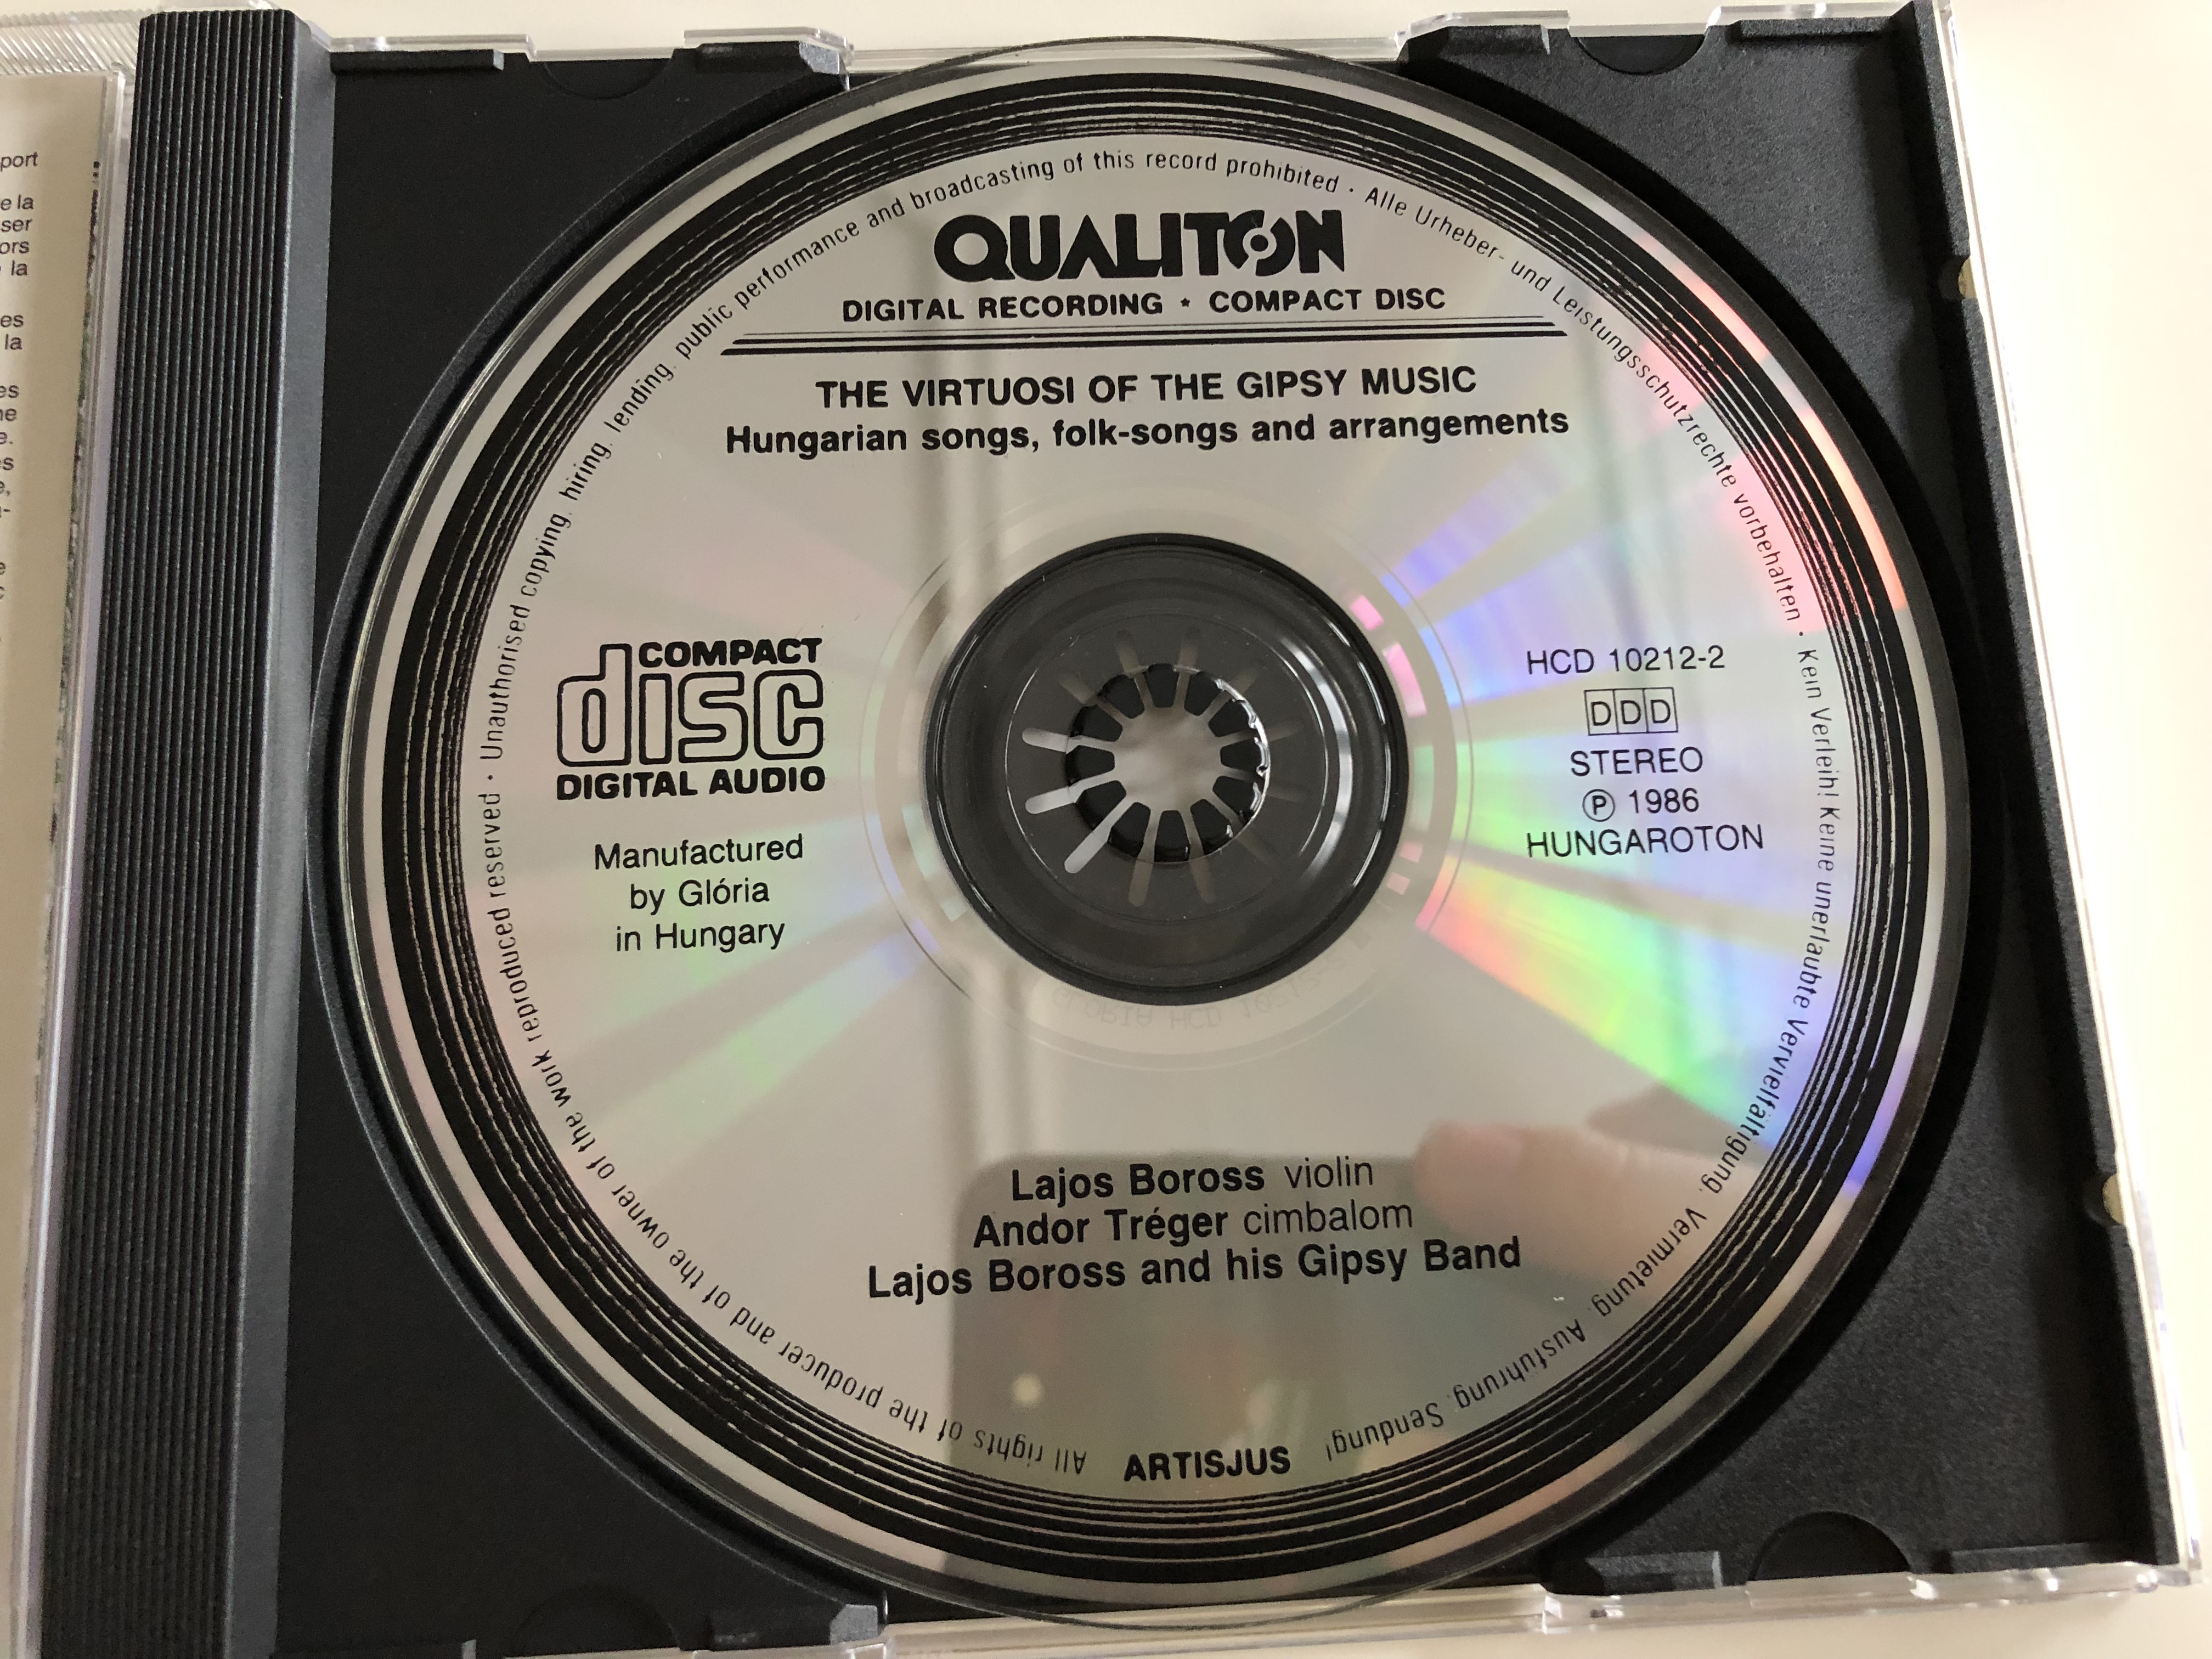 lajos-boross-and-his-gipsy-band-audio-cd-lajos-boross-violin-andor-tr-ger-cymbalo-the-virtuosi-of-the-gipsy-music-hungarian-songs-folk-songs-and-arrangements-qualiton-hcd-10212-2-6-.jpg